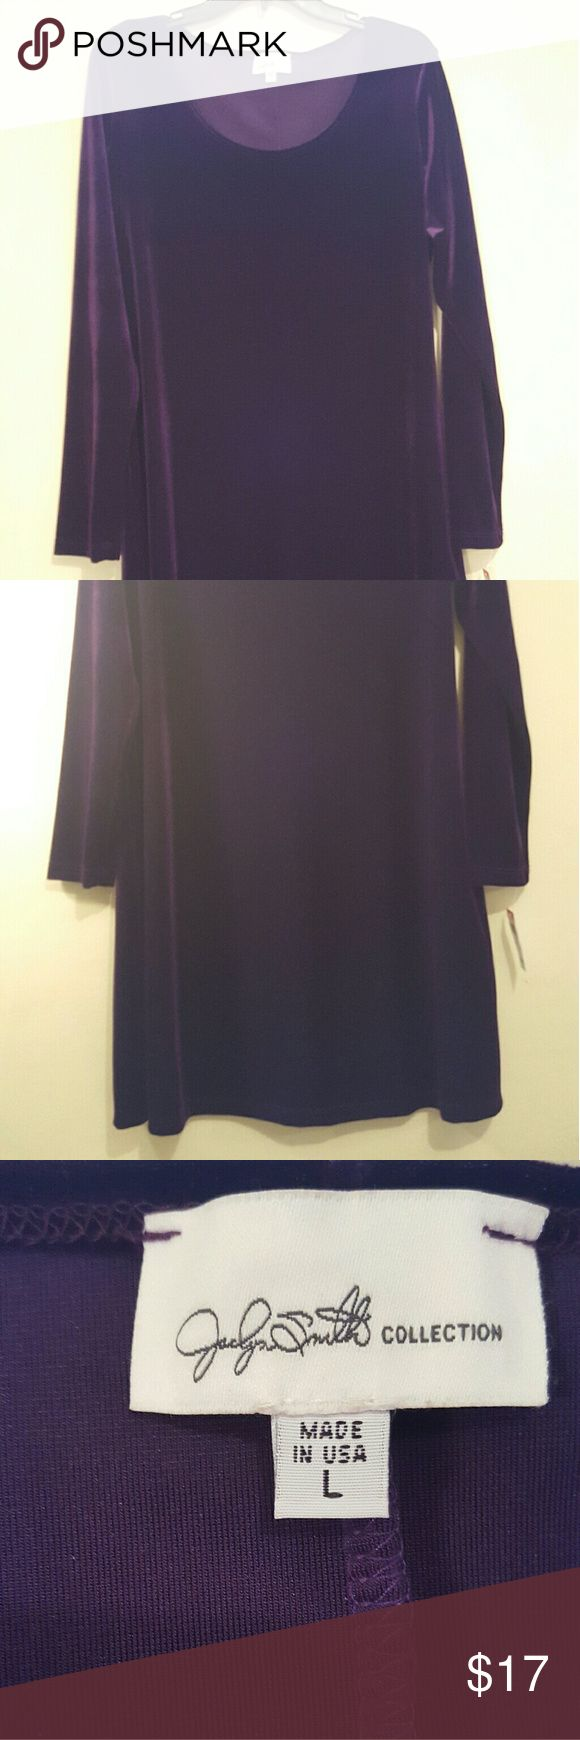 Jaclyn Smith Women's Dress Plum velvet Jaclyn Smith Women's Dress Plum velvet Jaclyn Smith Dresses Midi